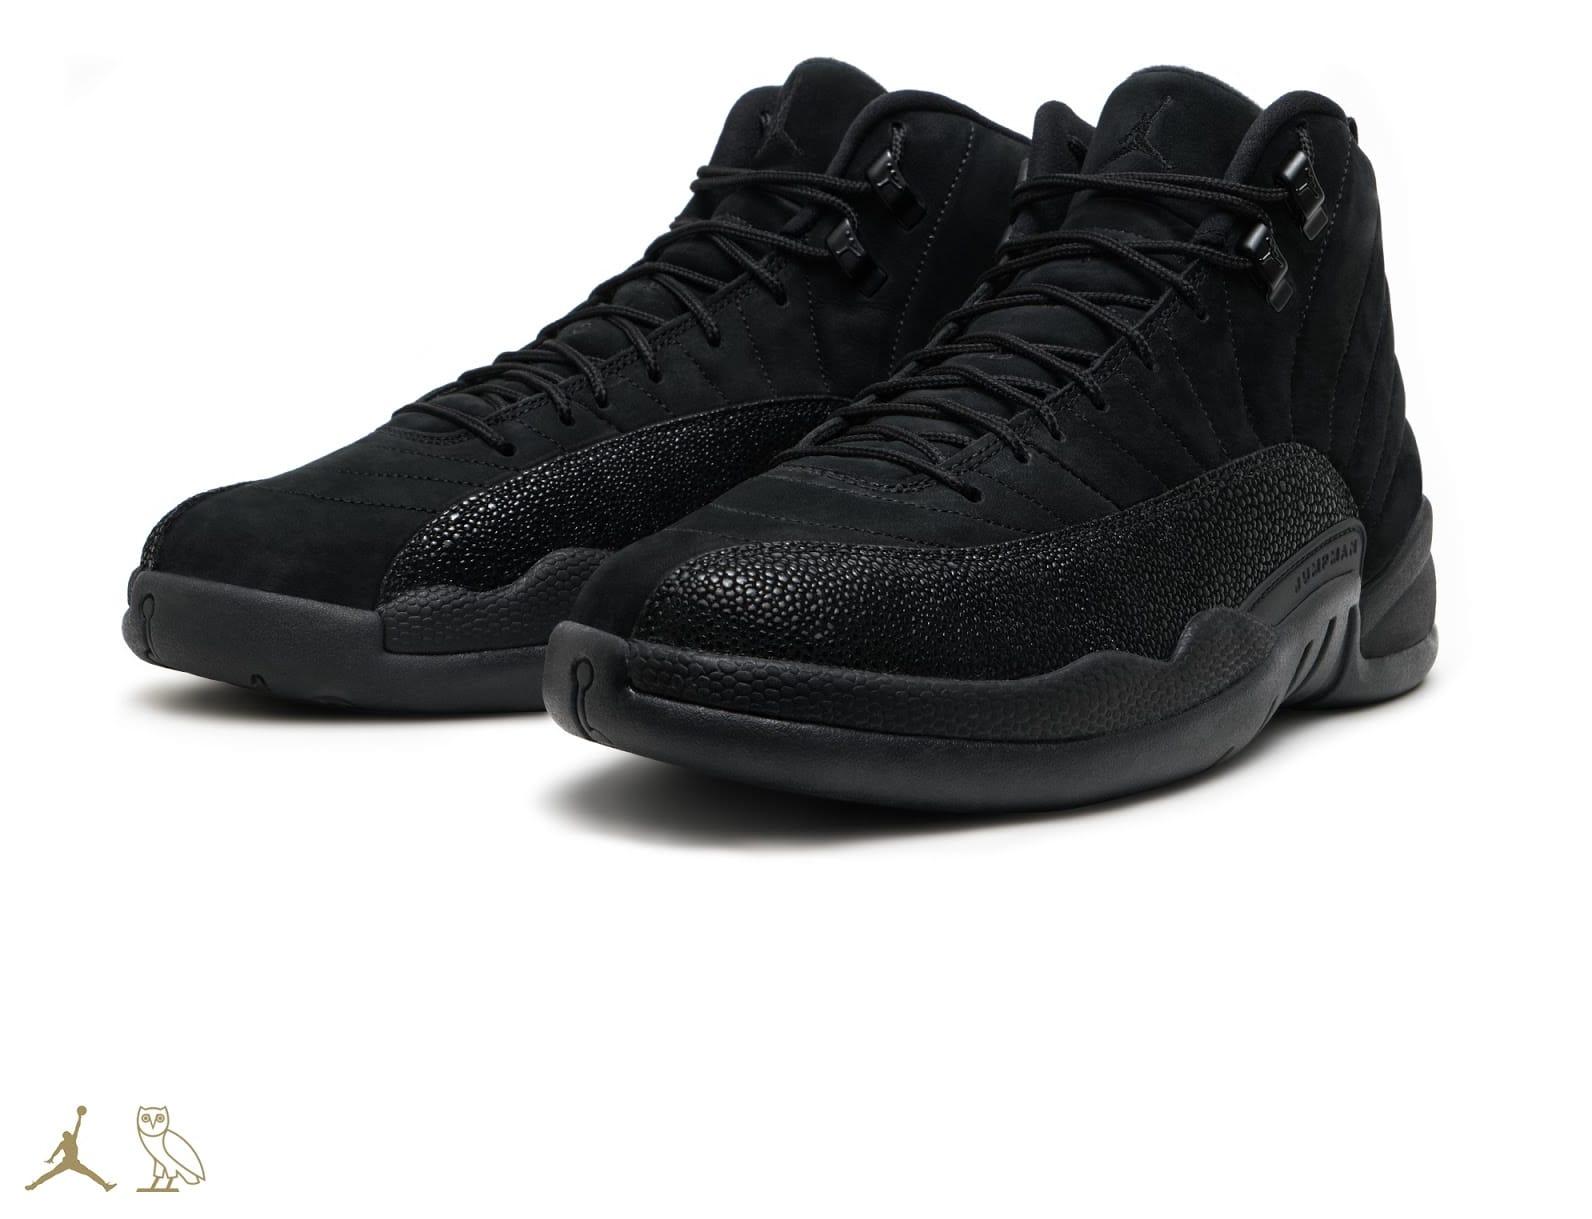 OVO Air Jordan 12 Black Release Date